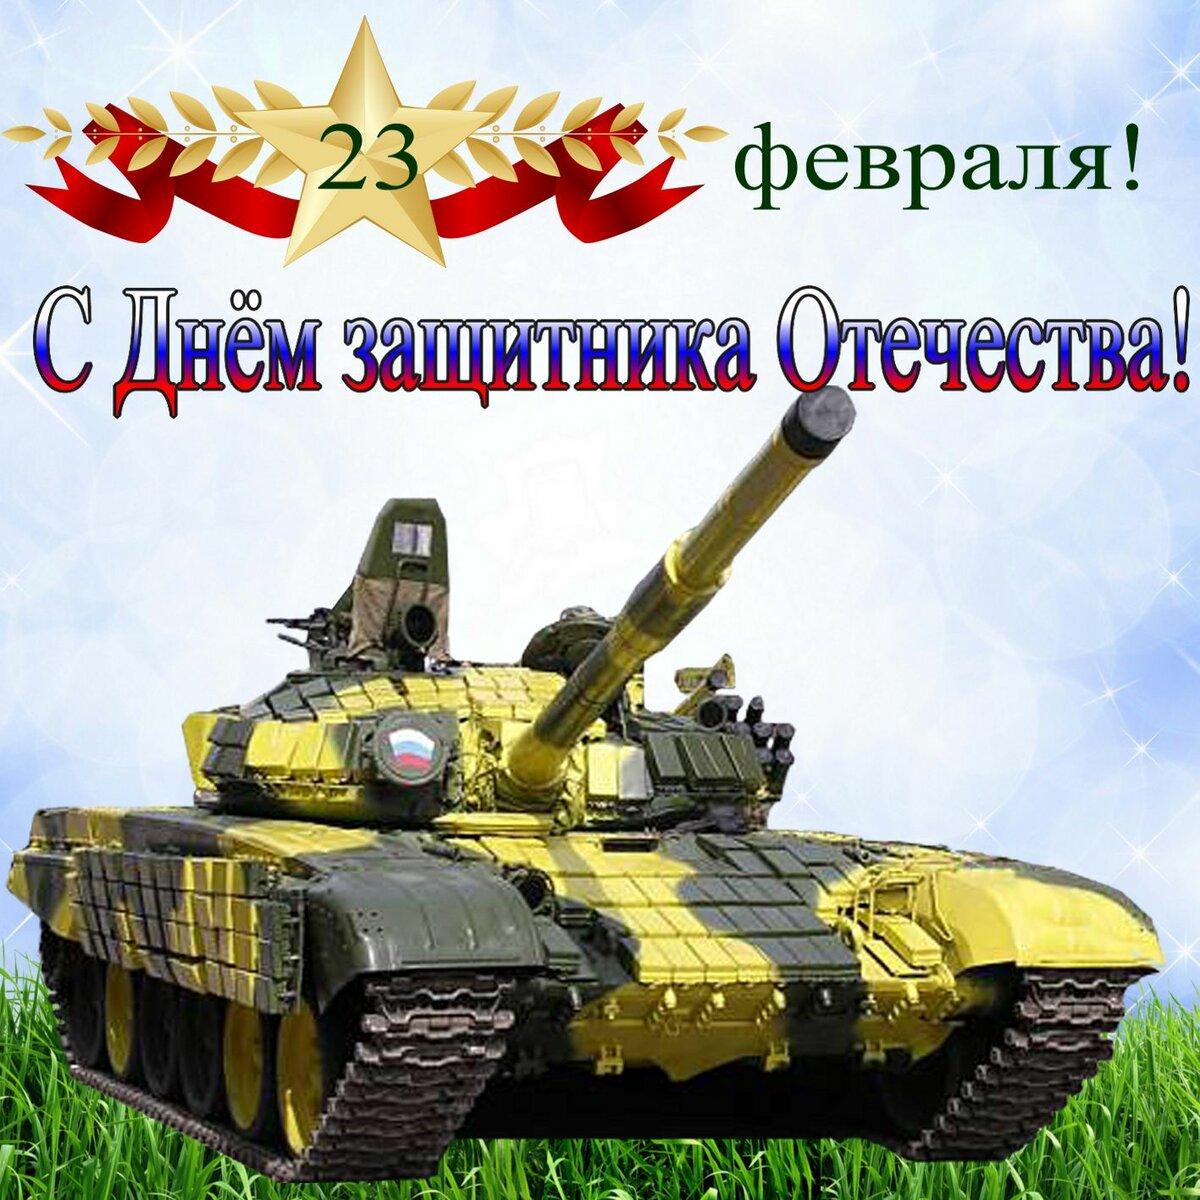 Открытки на 23 февраля картинки с танками